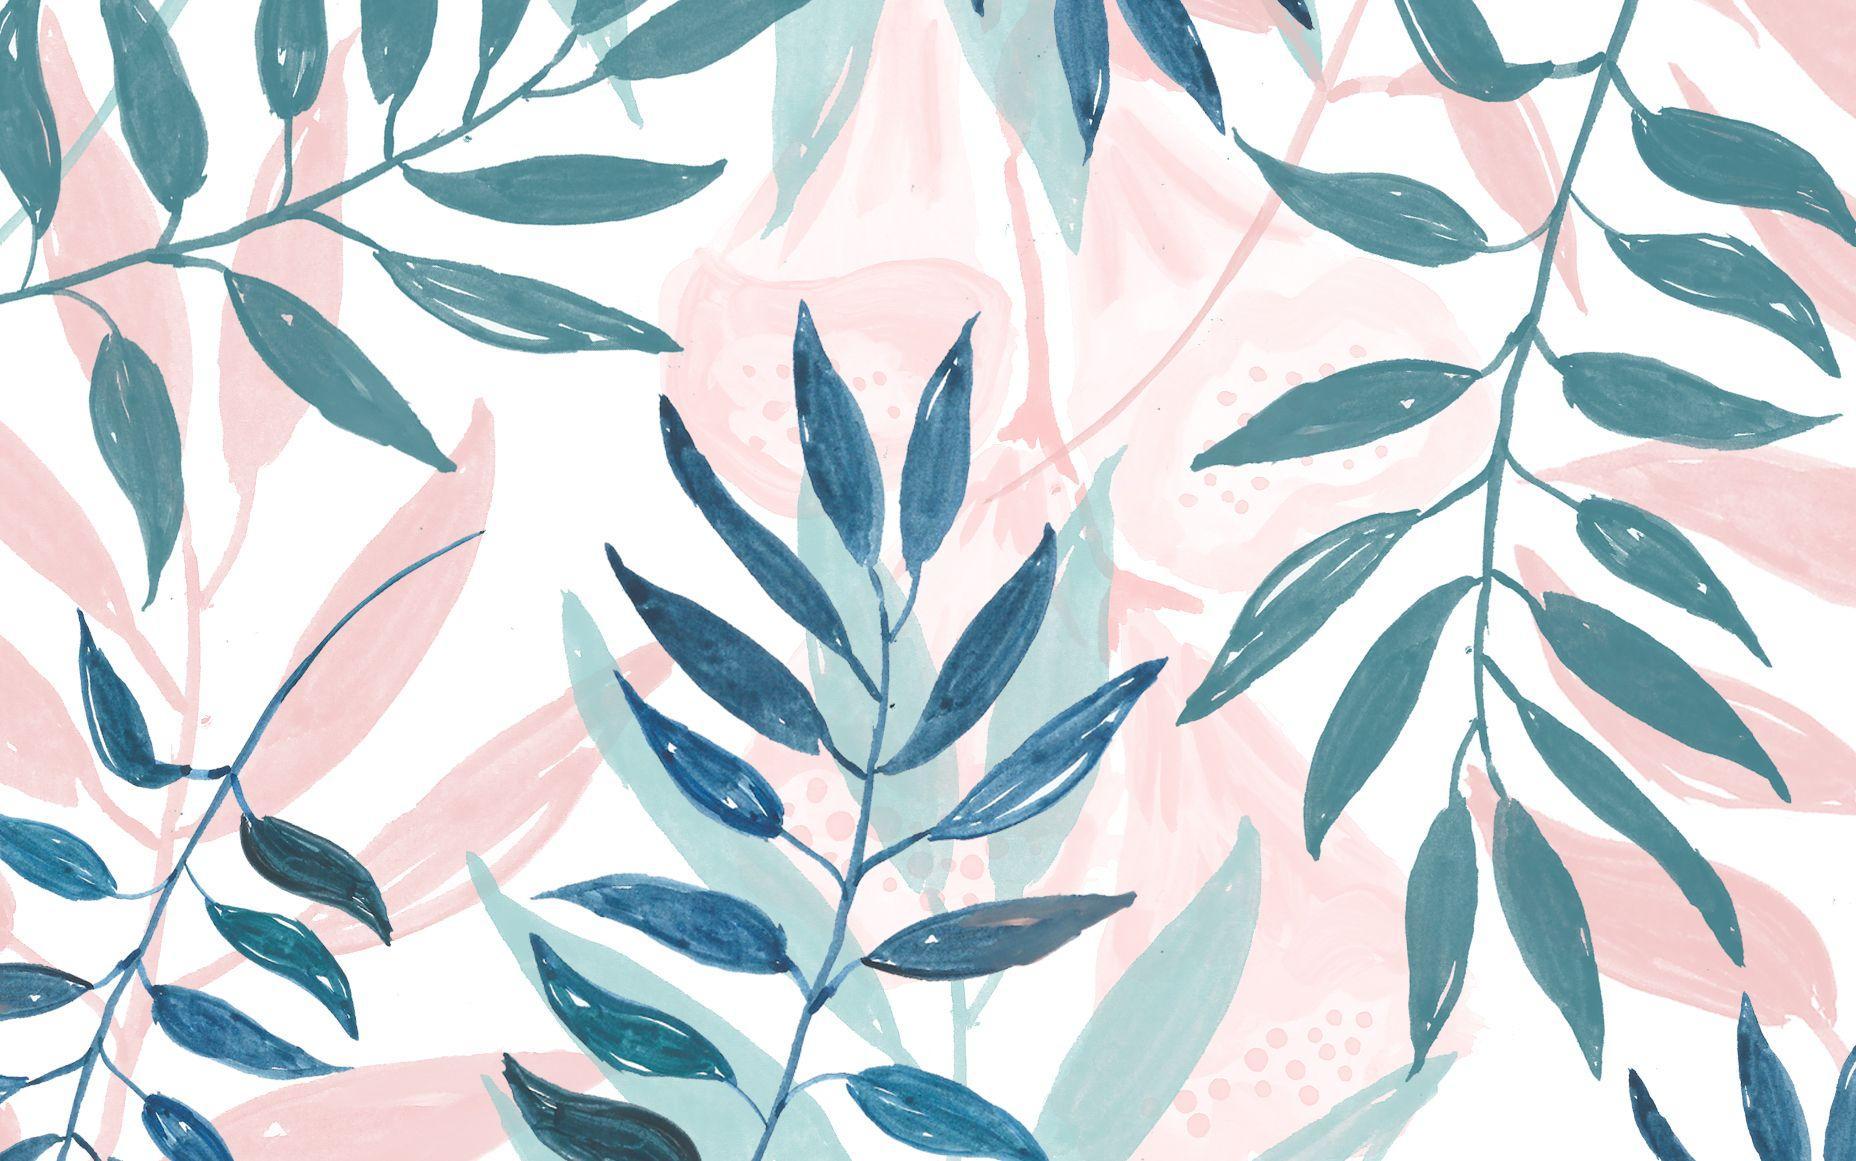 Aesthetic Grid Plants Wallpapers Top Free Aesthetic Grid Plants